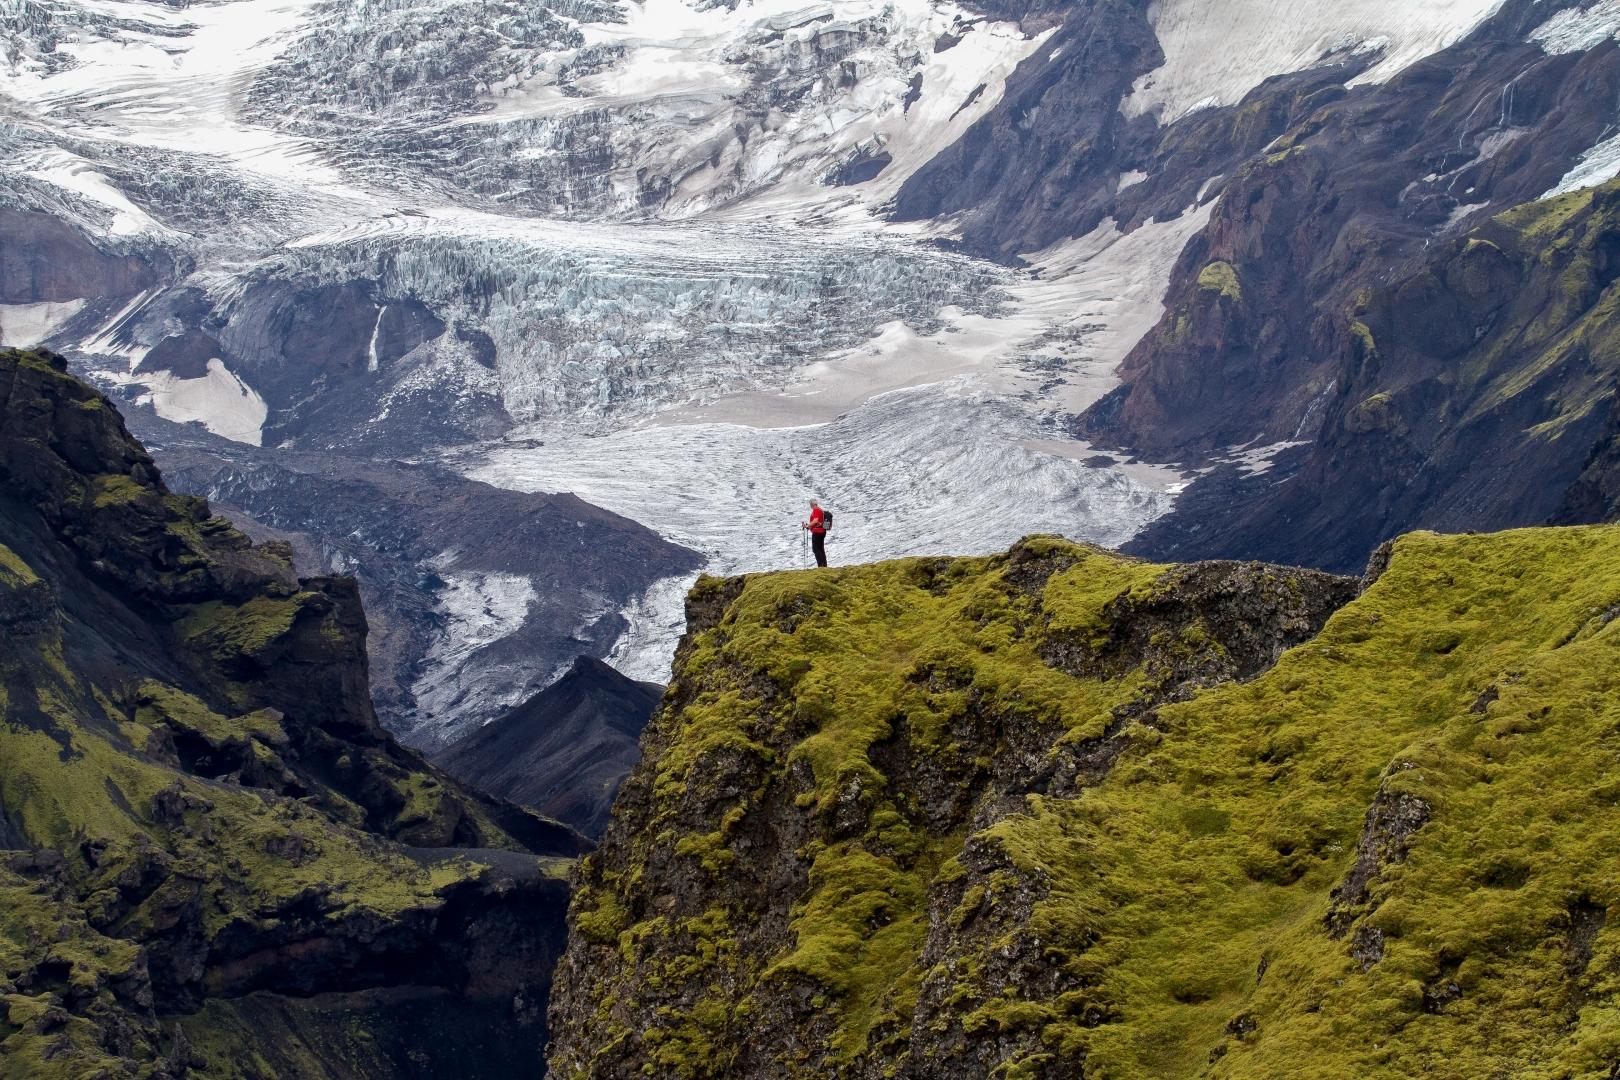 Sur le sentier Laugavegur, vous aurez une vue imprenable sur les glaciers Vatnajökull, Mýrdalsjökull et Eyjafjallajökull.